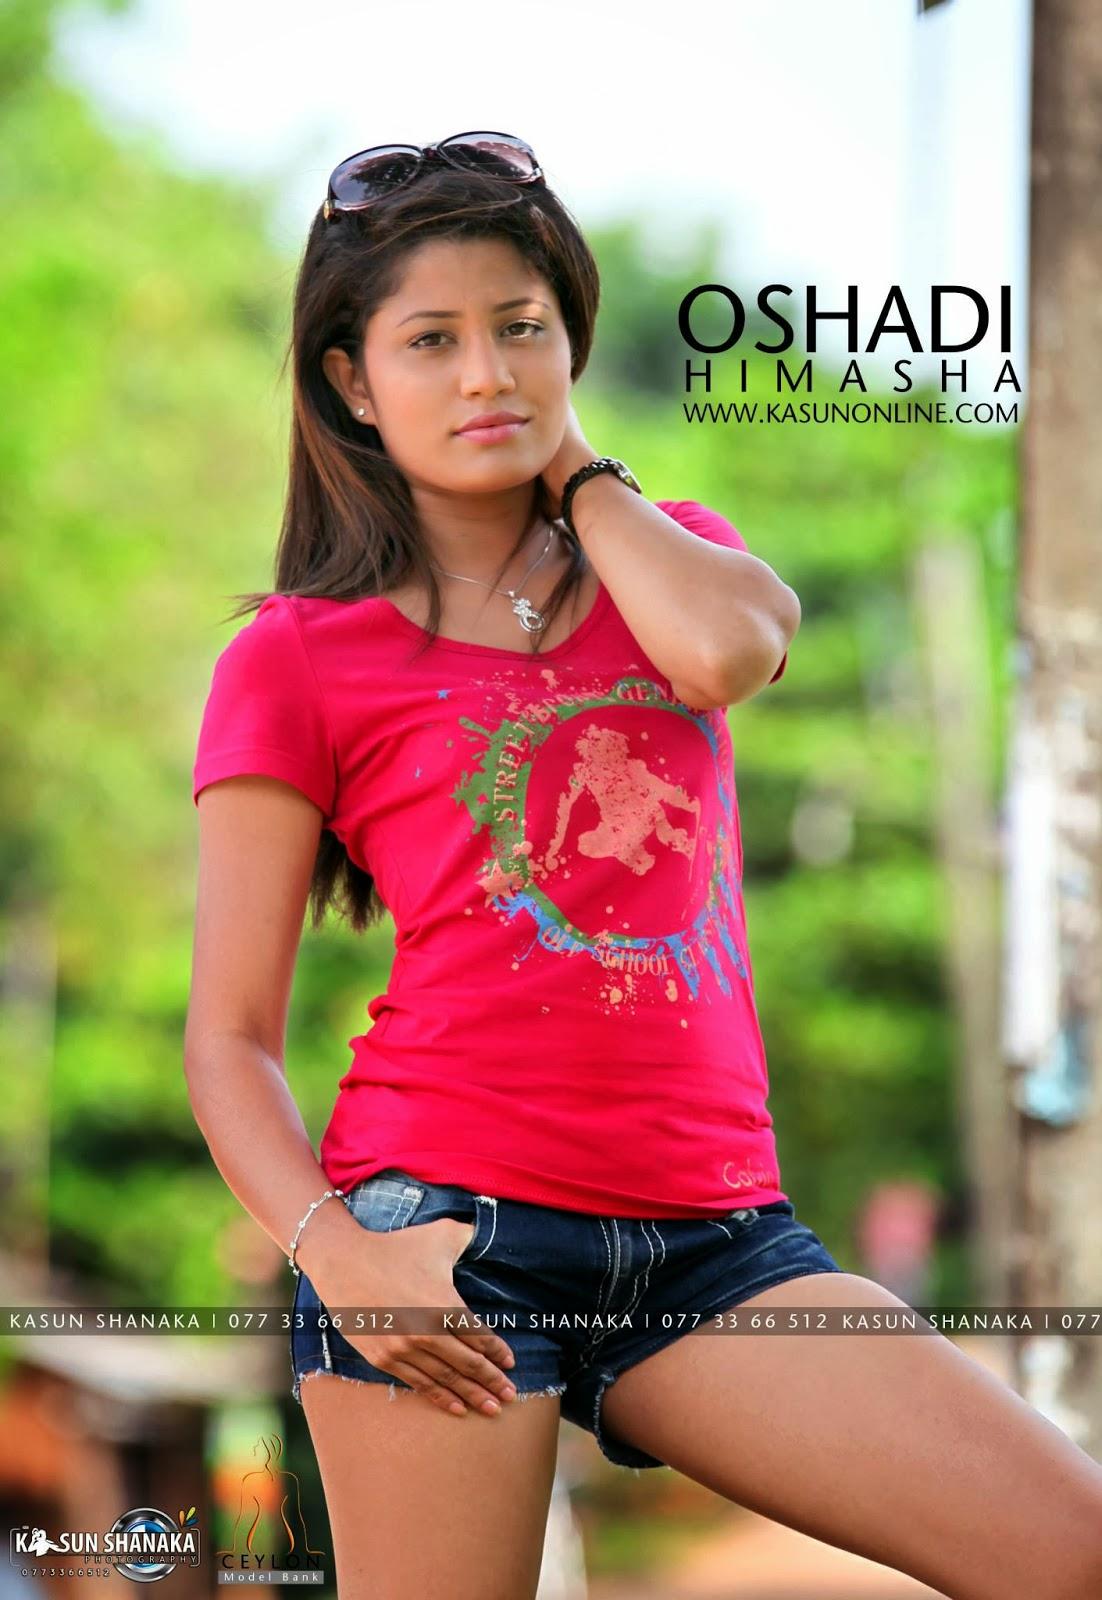 SL Hot Actress Pics: Oshadi Himasha new pink hot photos stills images